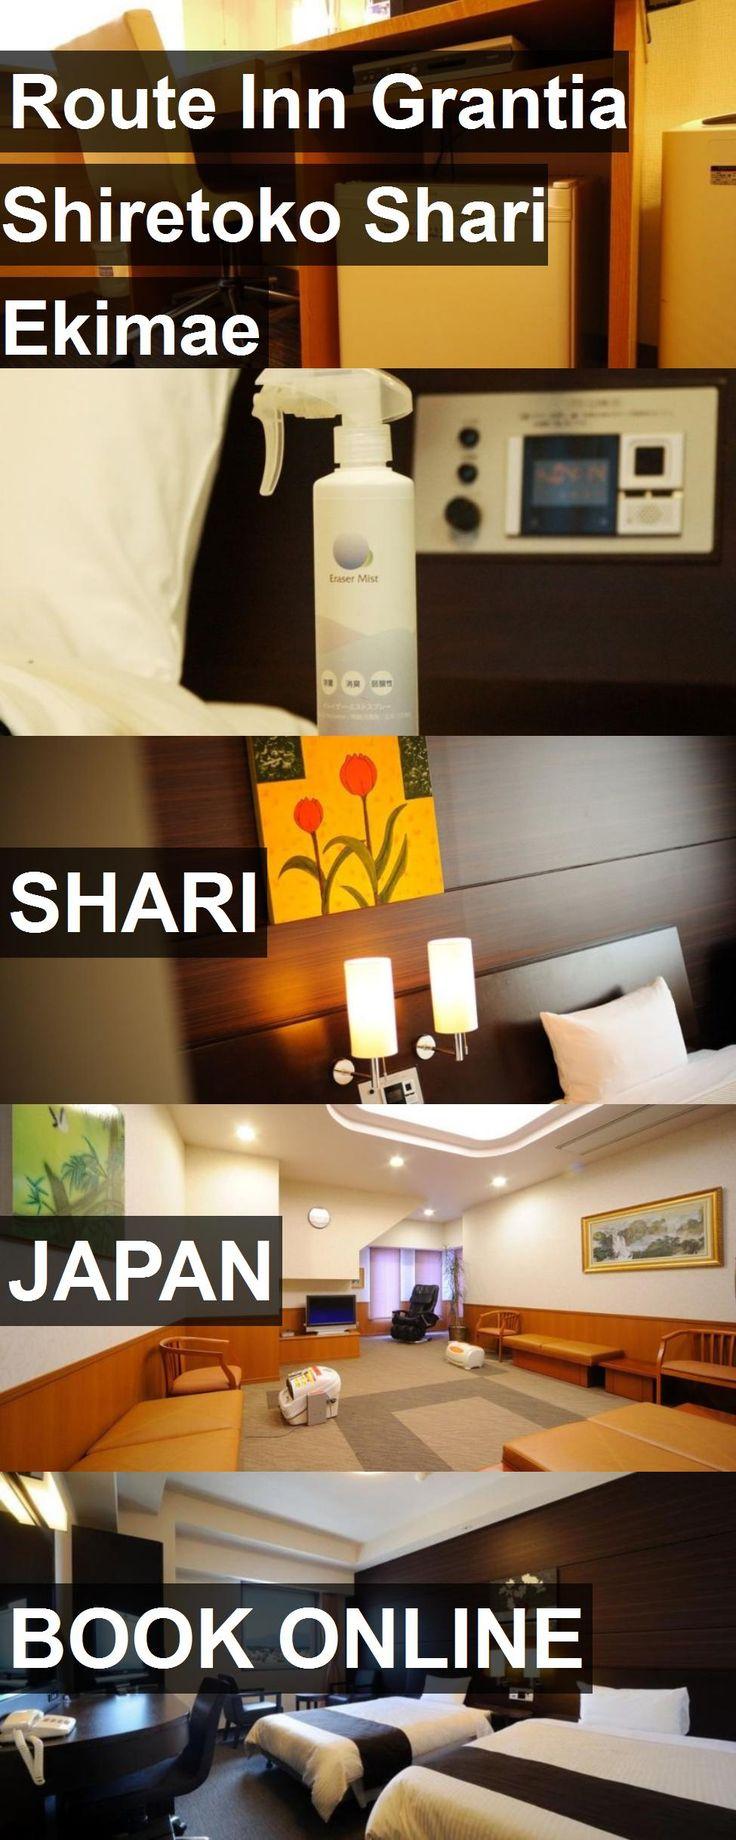 Hotel Route Inn Grantia Shiretoko Shari Ekimae in Shari, Japan. For more information, photos, reviews and best prices please follow the link. #Japan #Shari #travel #vacation #hotel